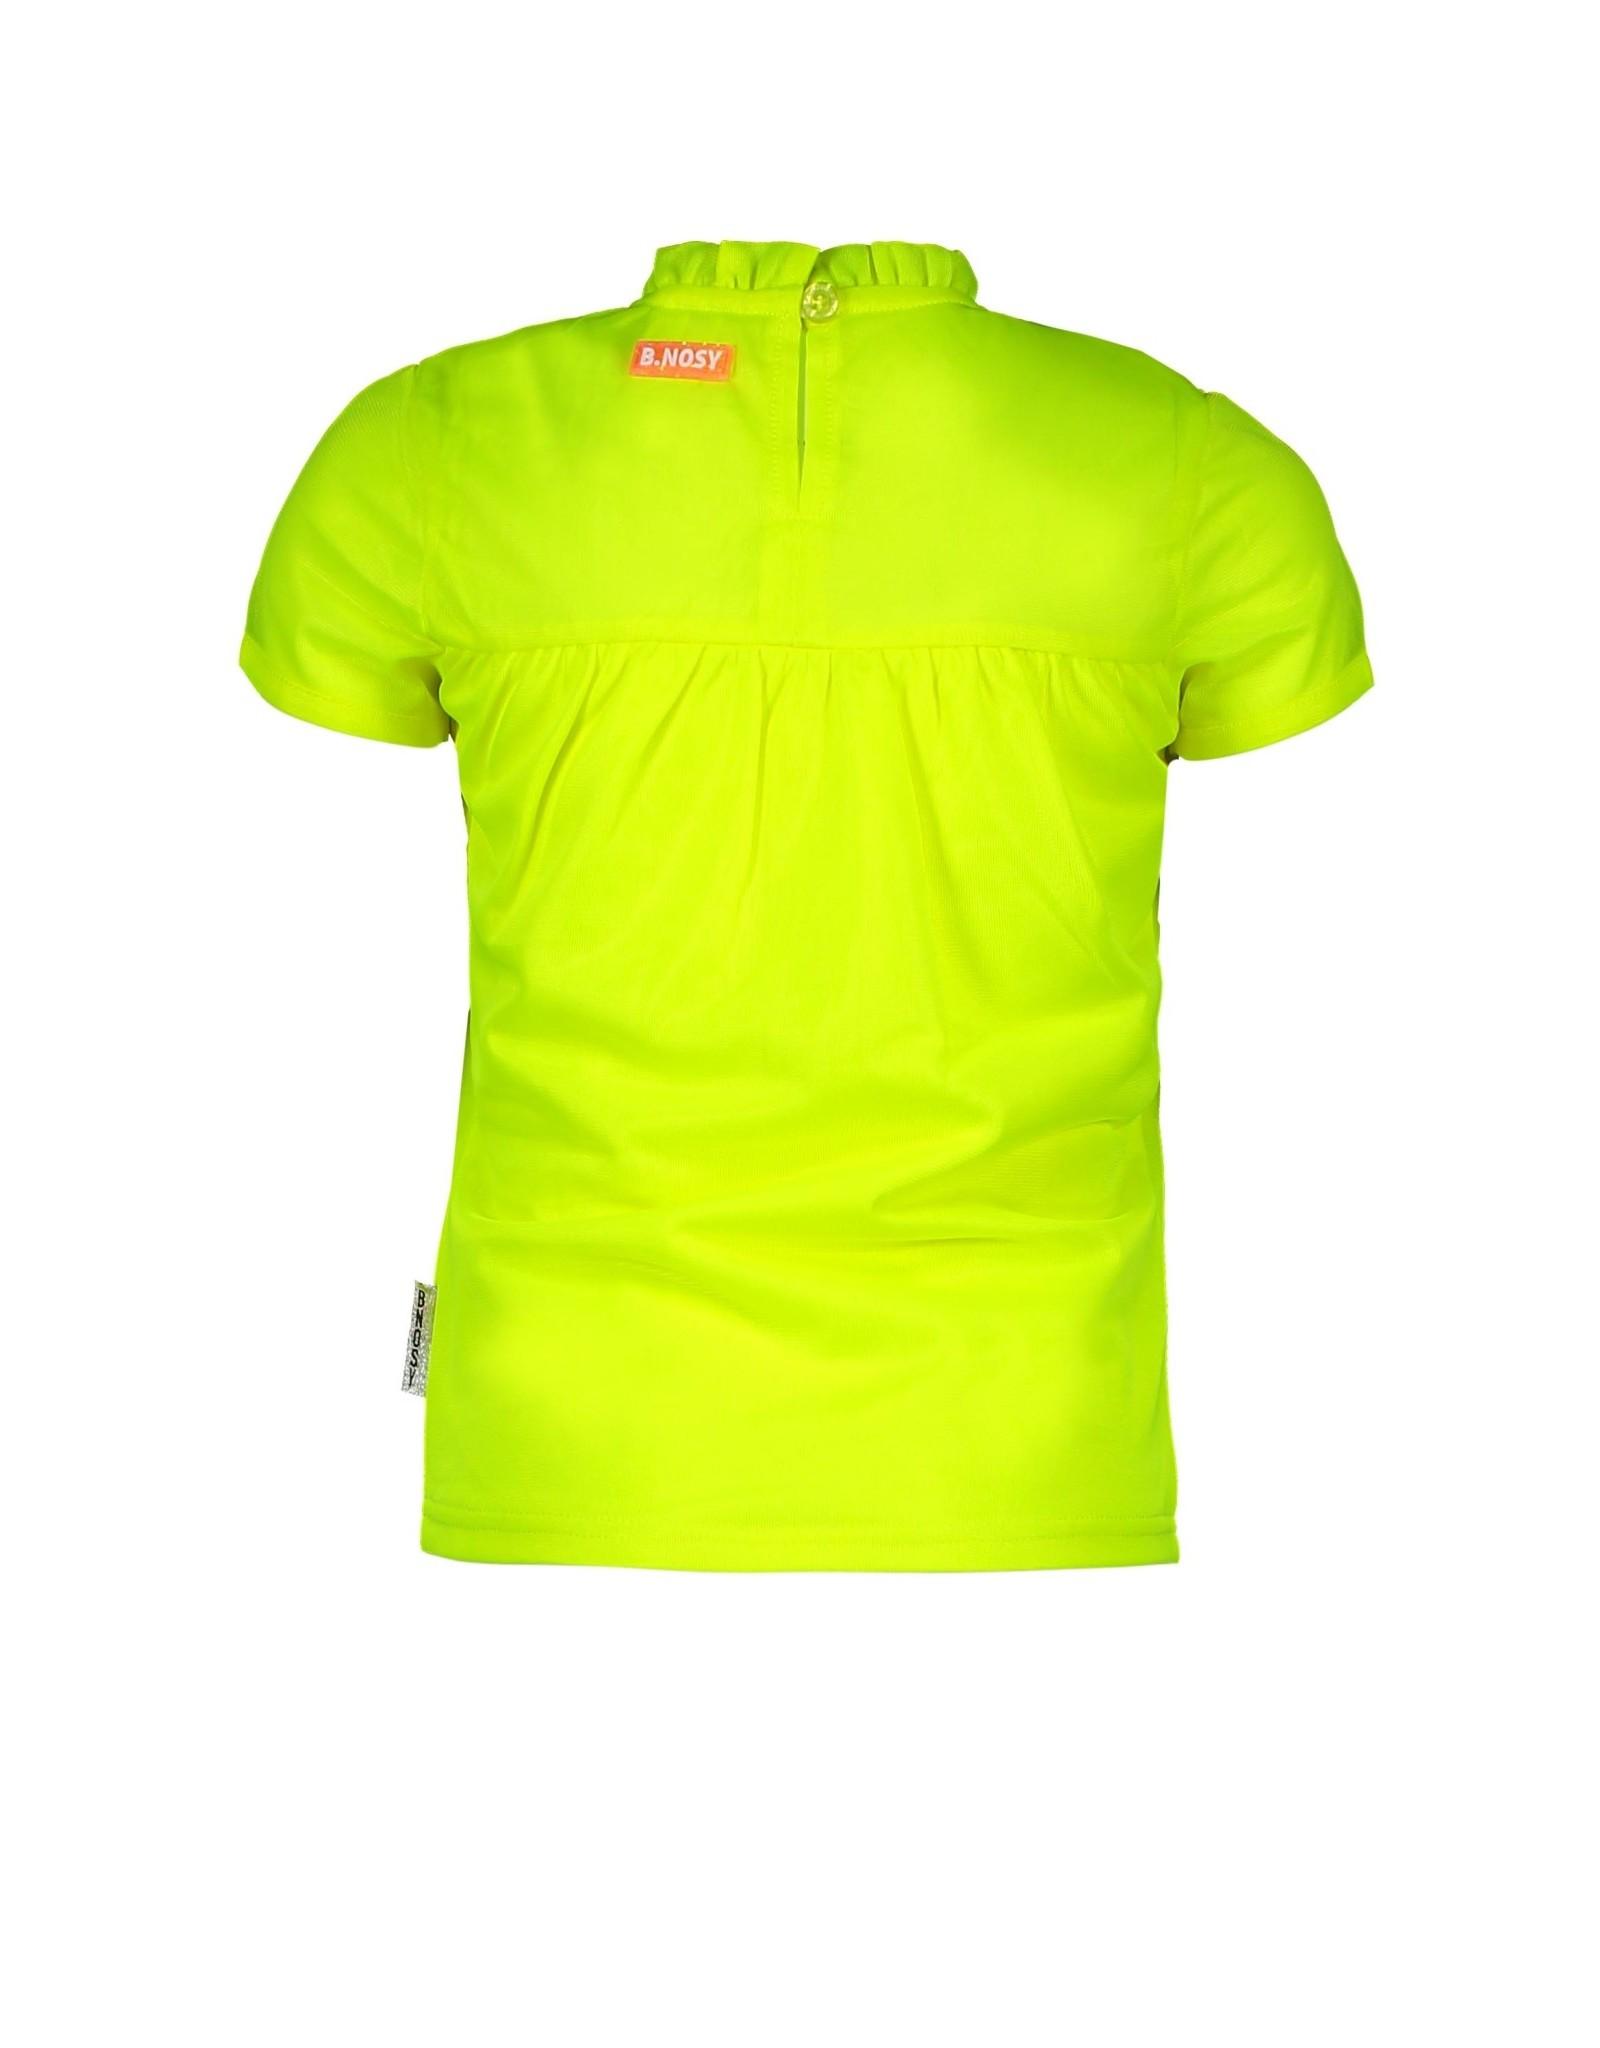 B.Nosy B.Nosy meisjes t-shirt gesmokt Safety Yellow